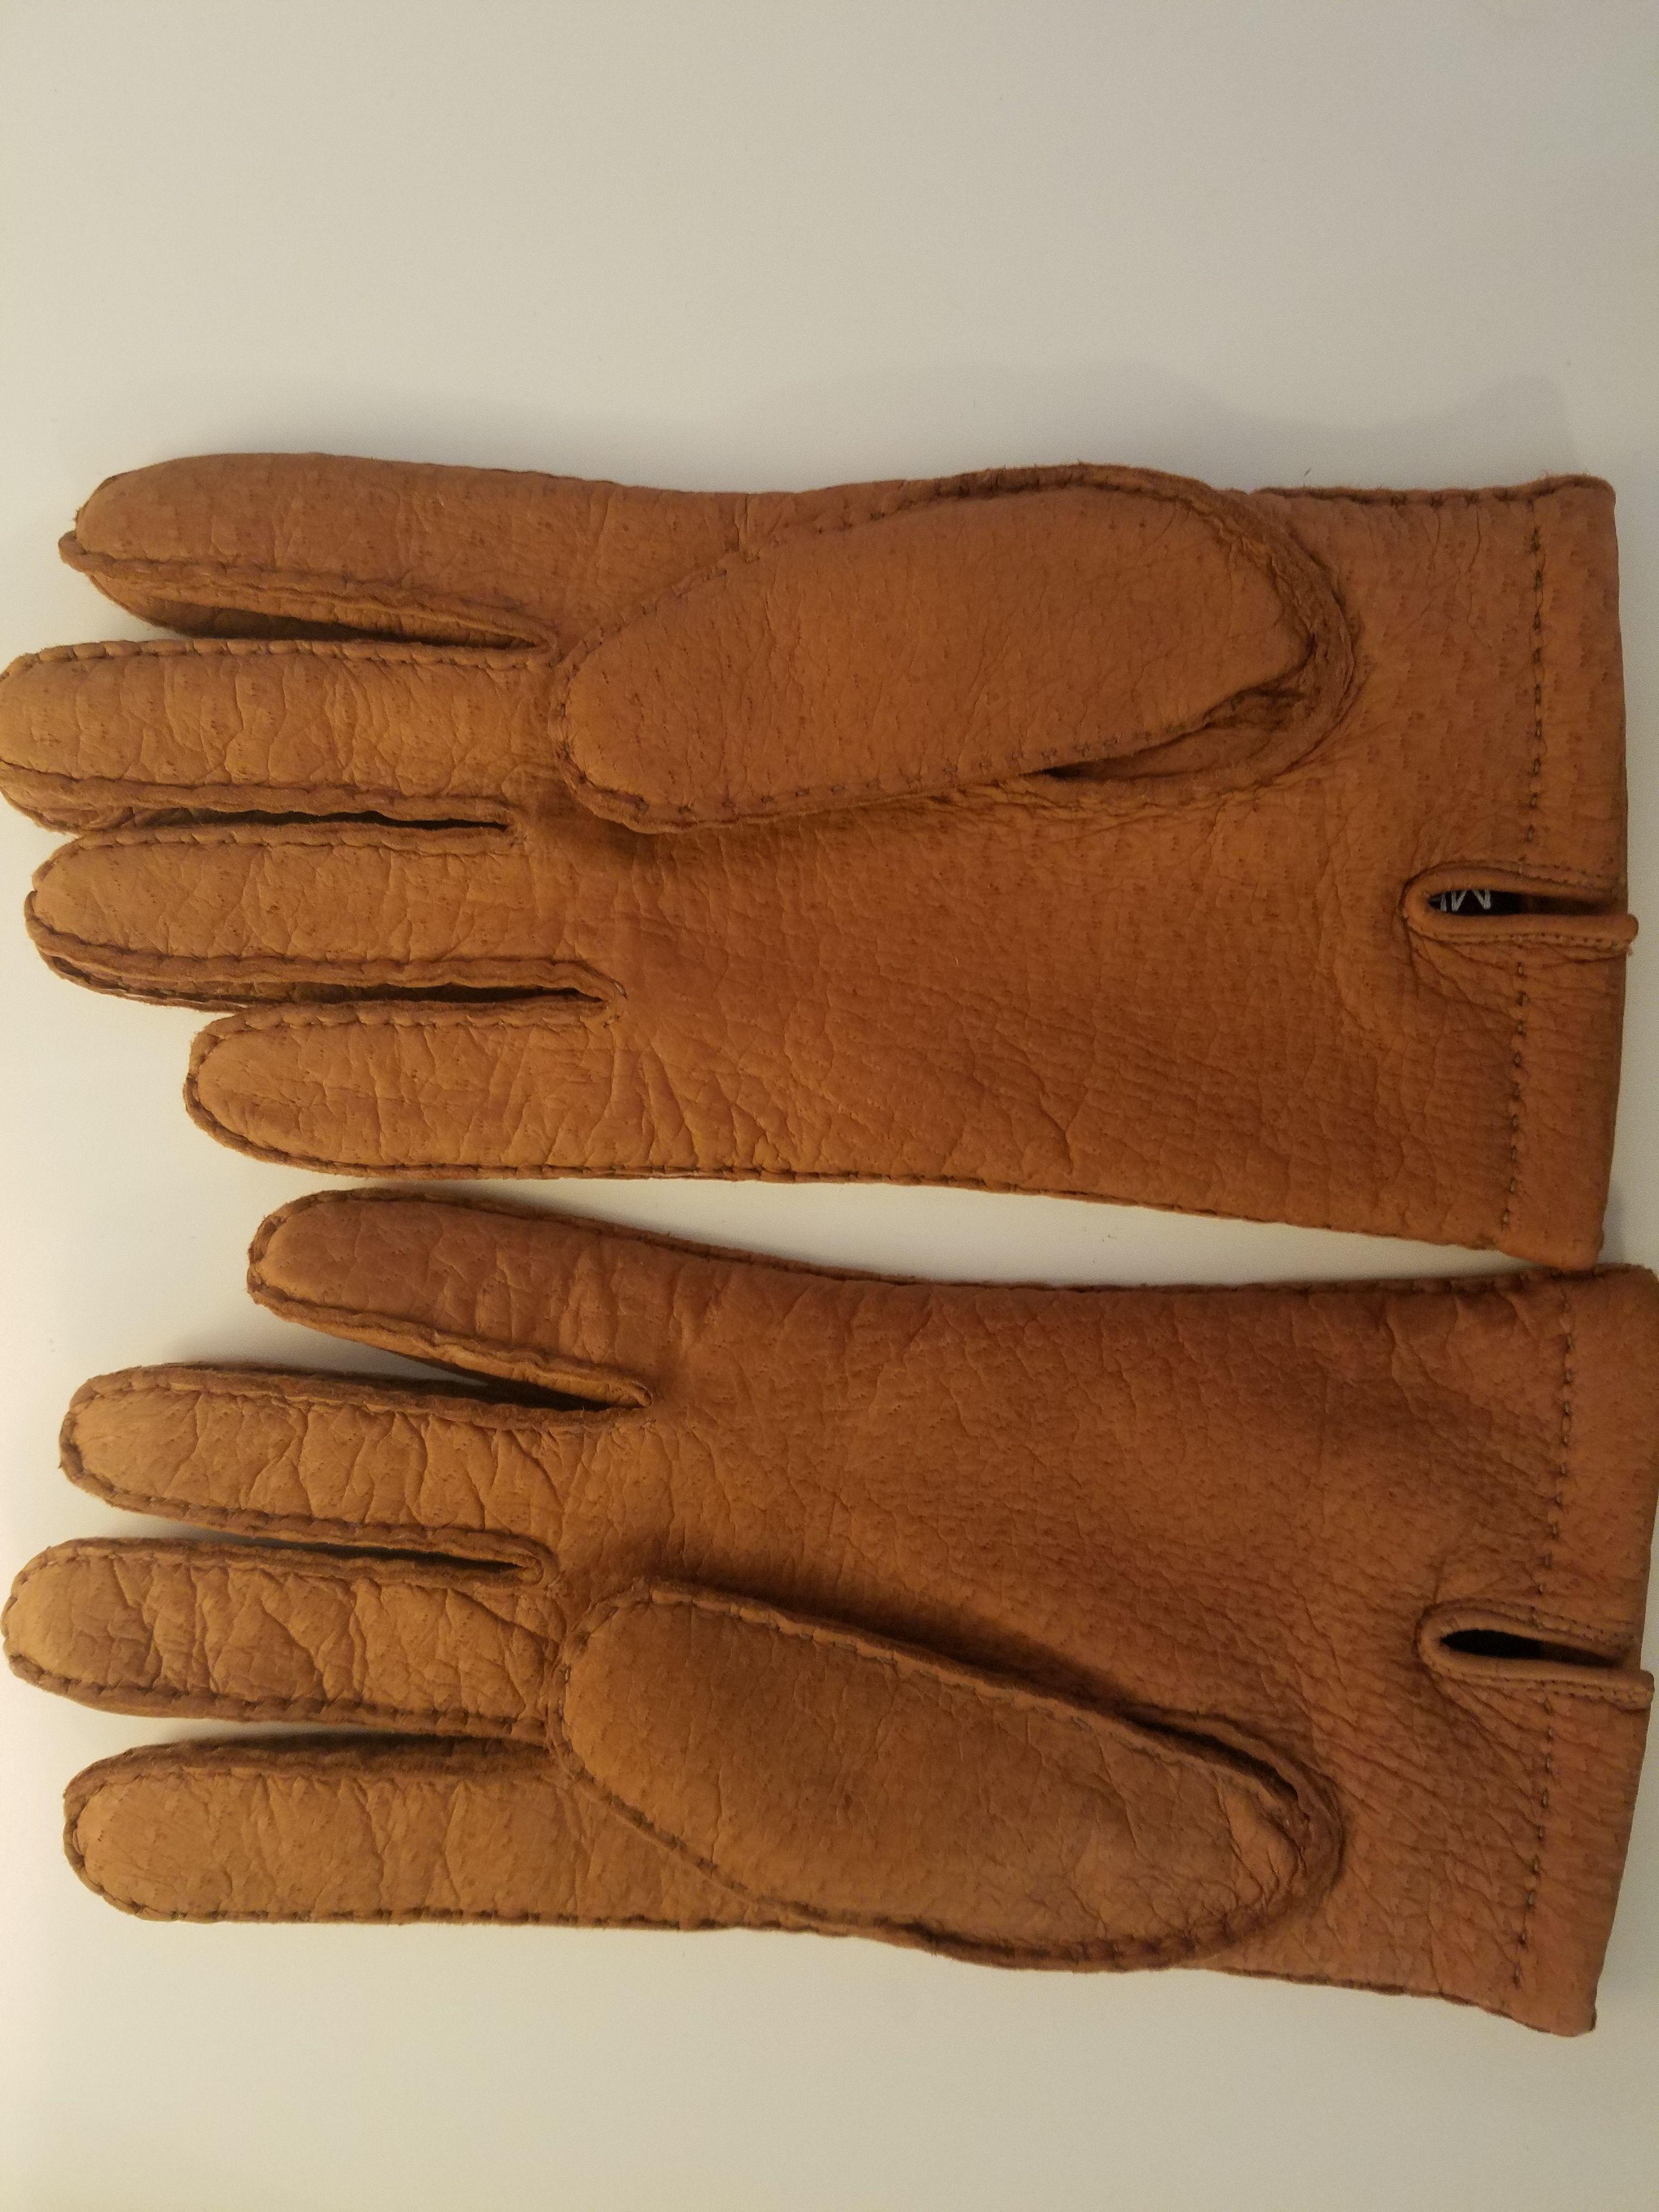 Jmm722's photos in LNIB Merola Peccary Gloves 9